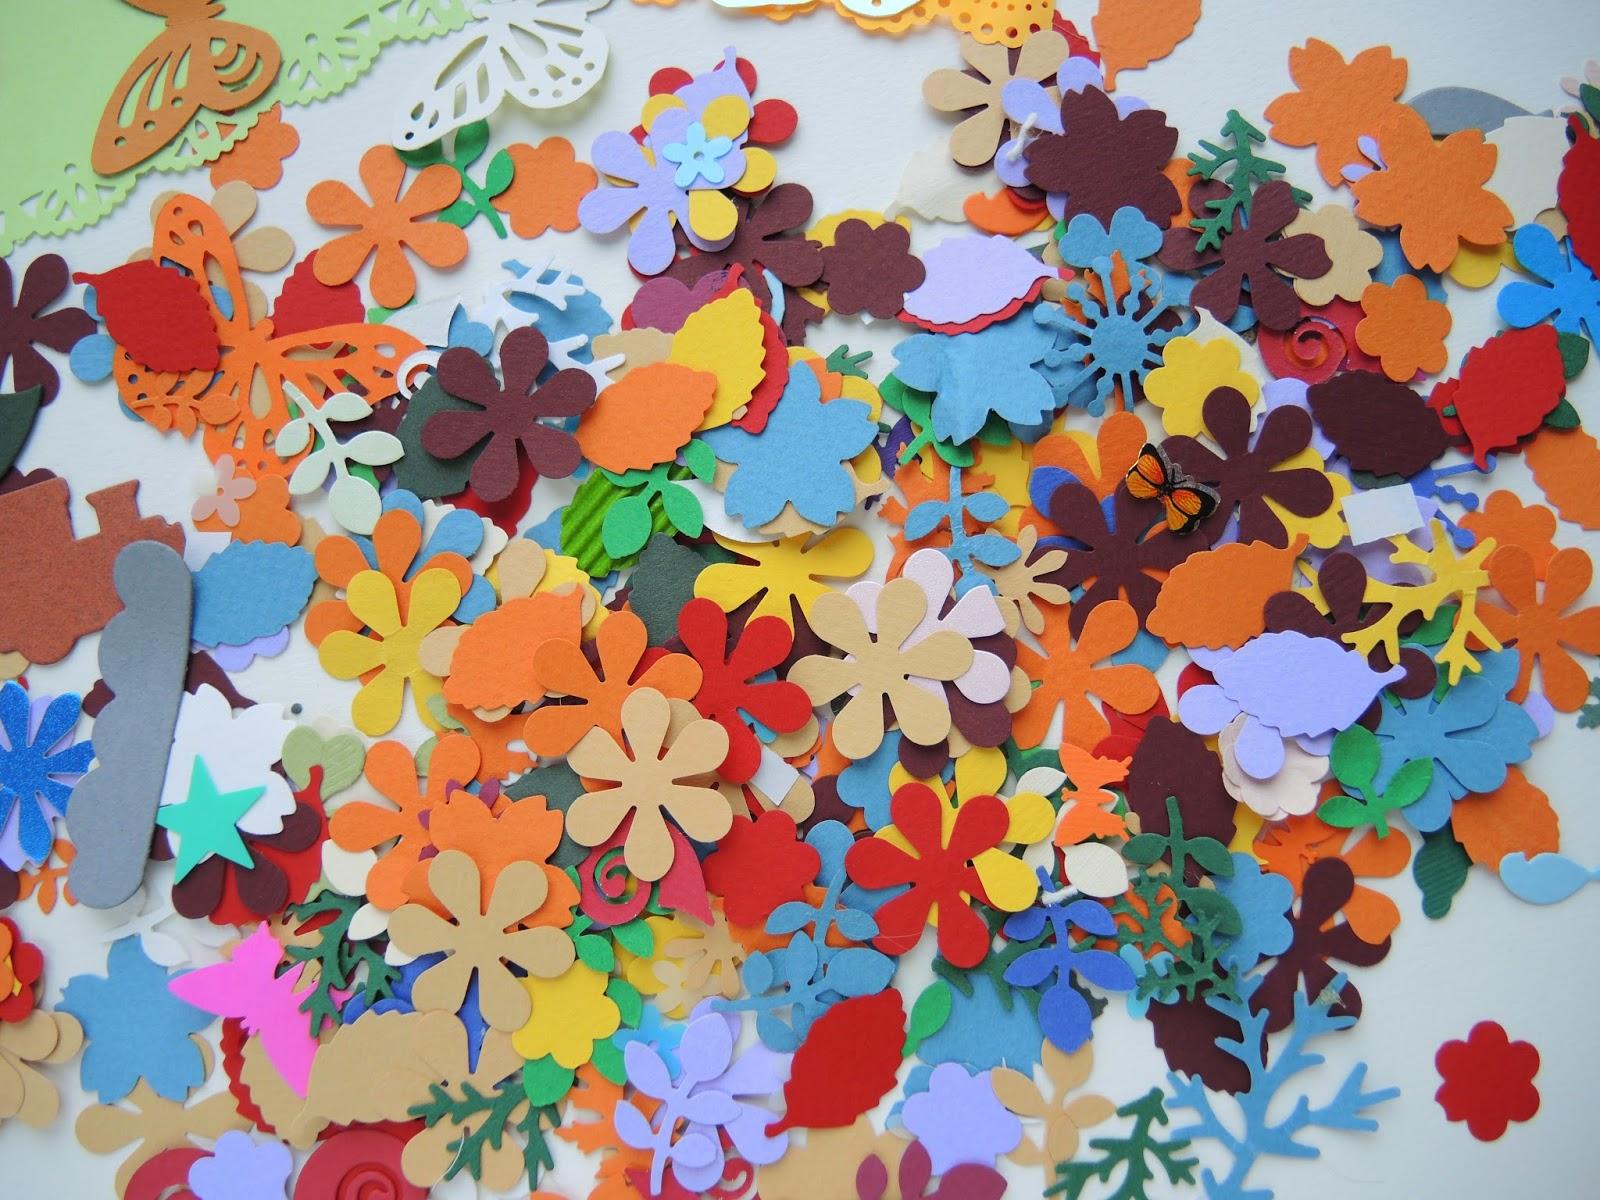 листы для скрапба цветы из бумаги мк ленты тесьма наклейки подарок